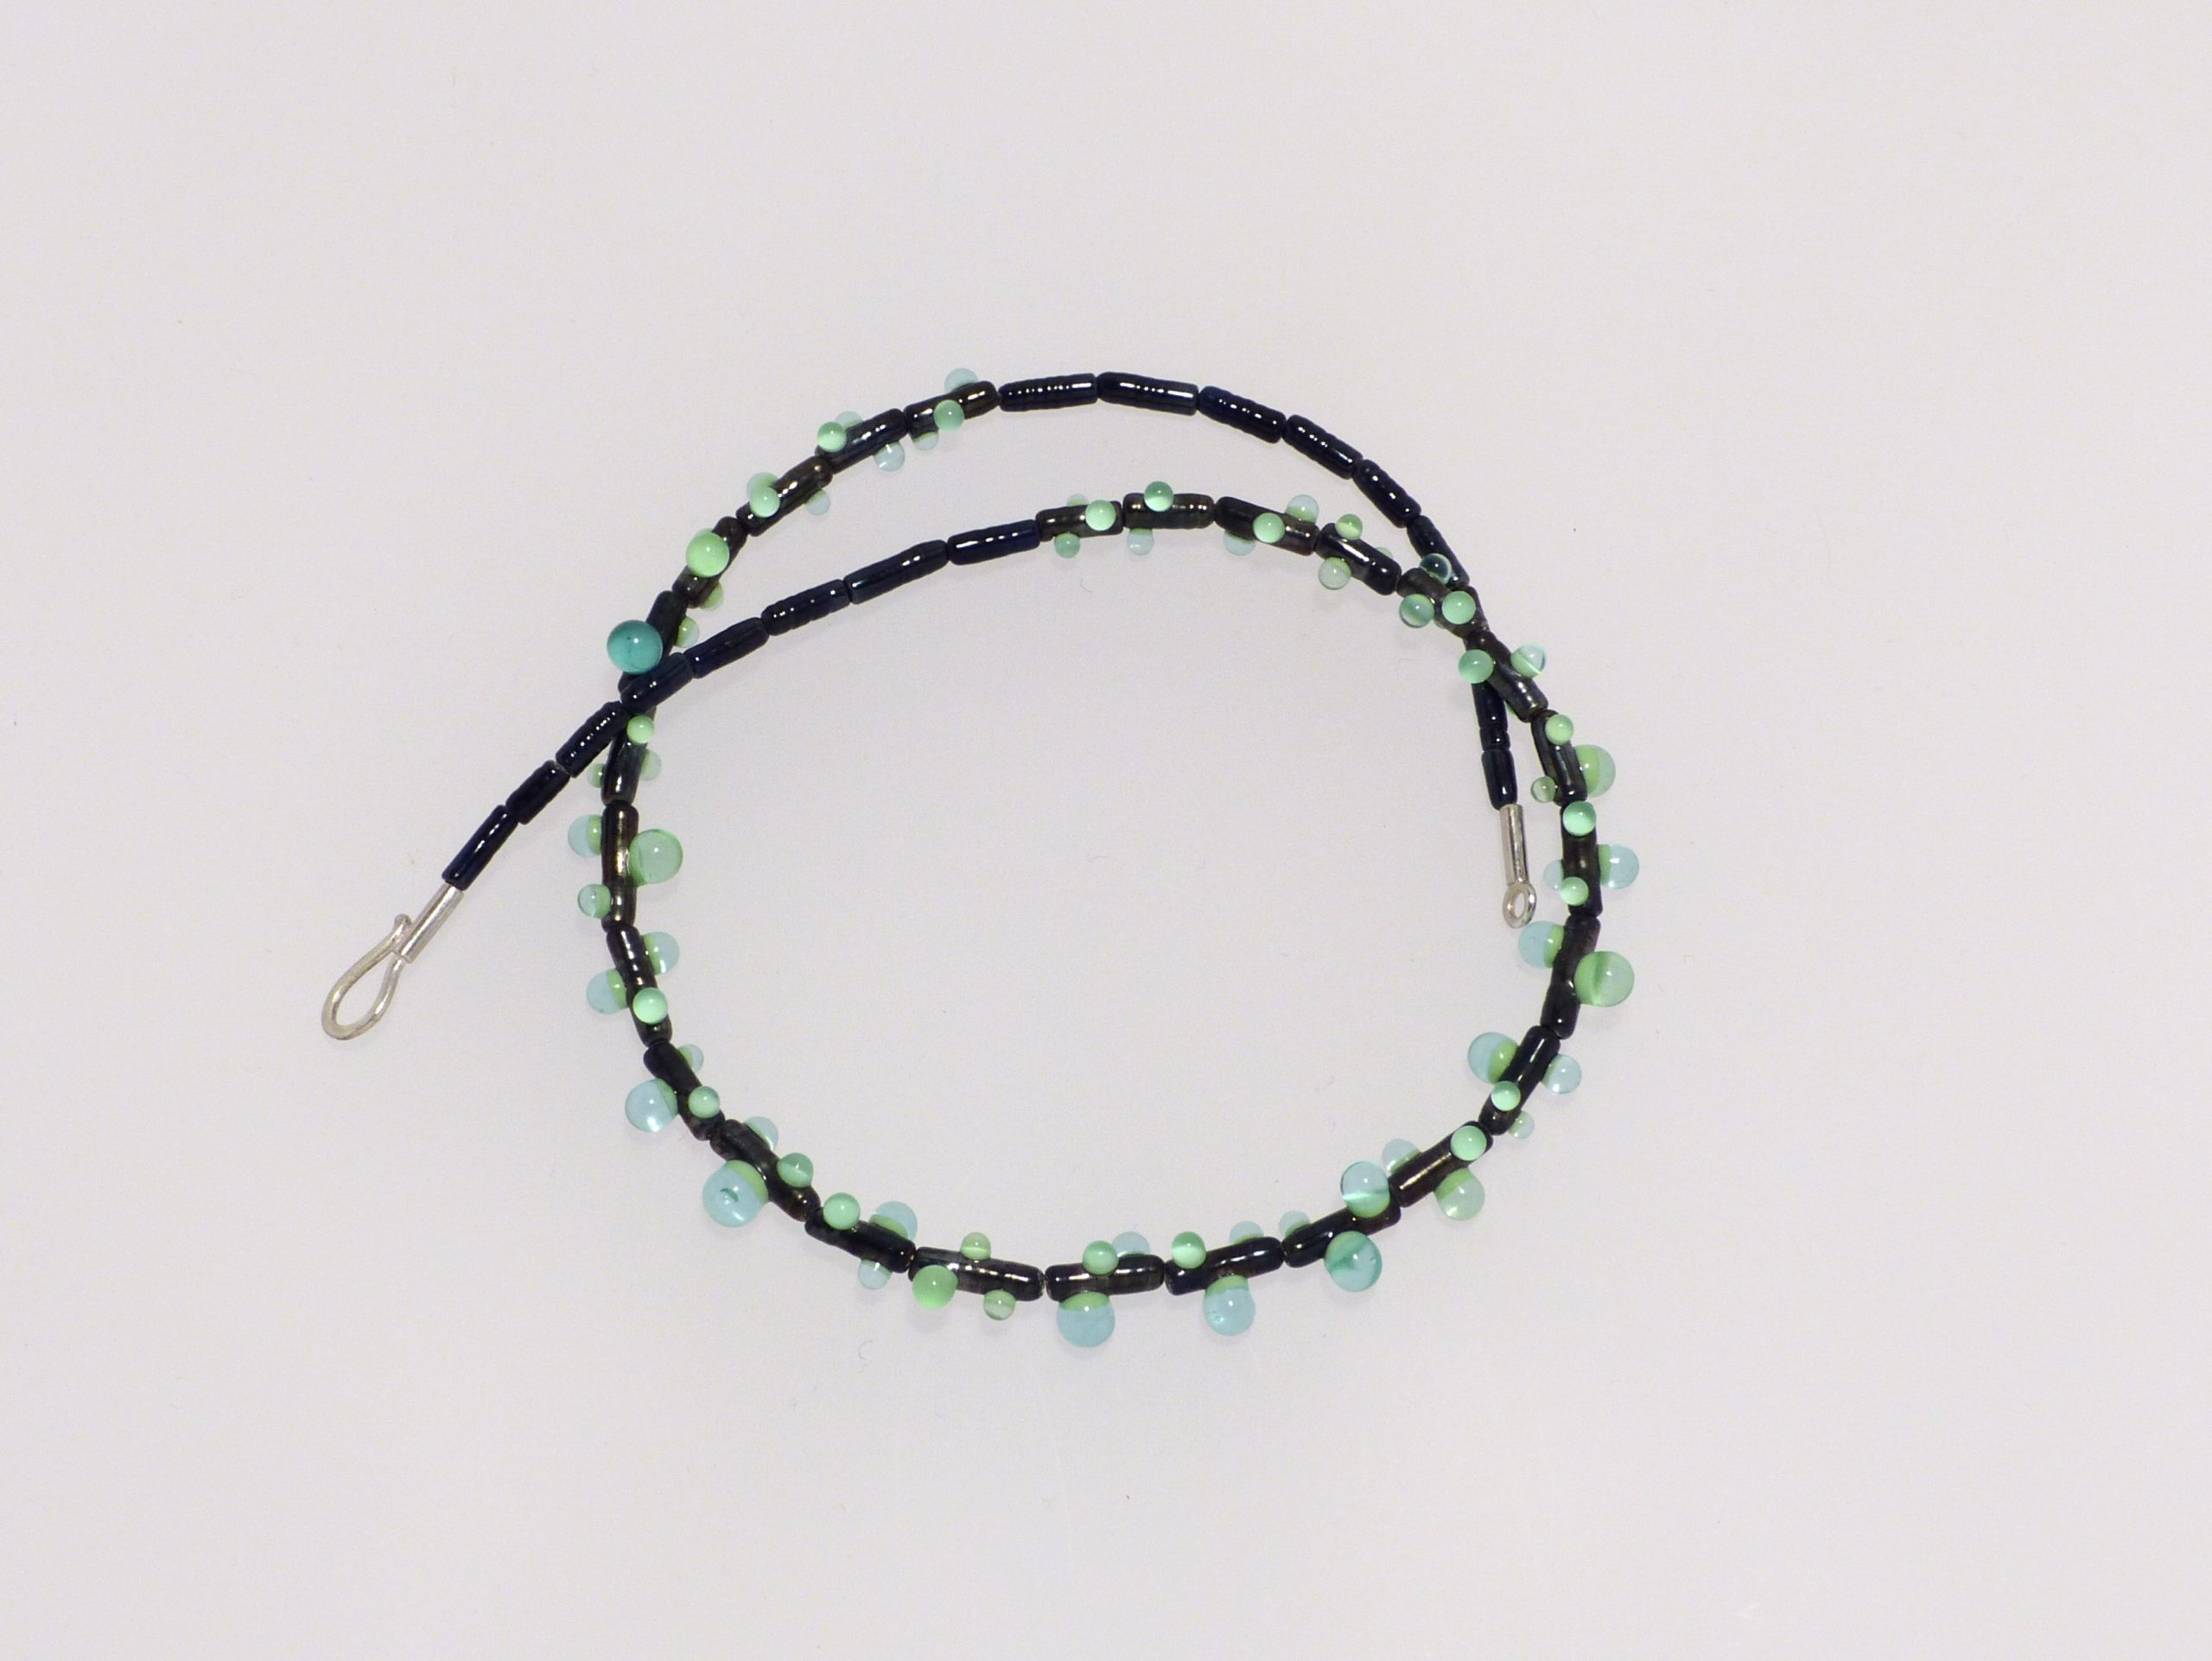 Tau nachtblau-bl. /gr.-blautransp. | 3 farbig Glas, Stahlseil, Silber | 090997c-19